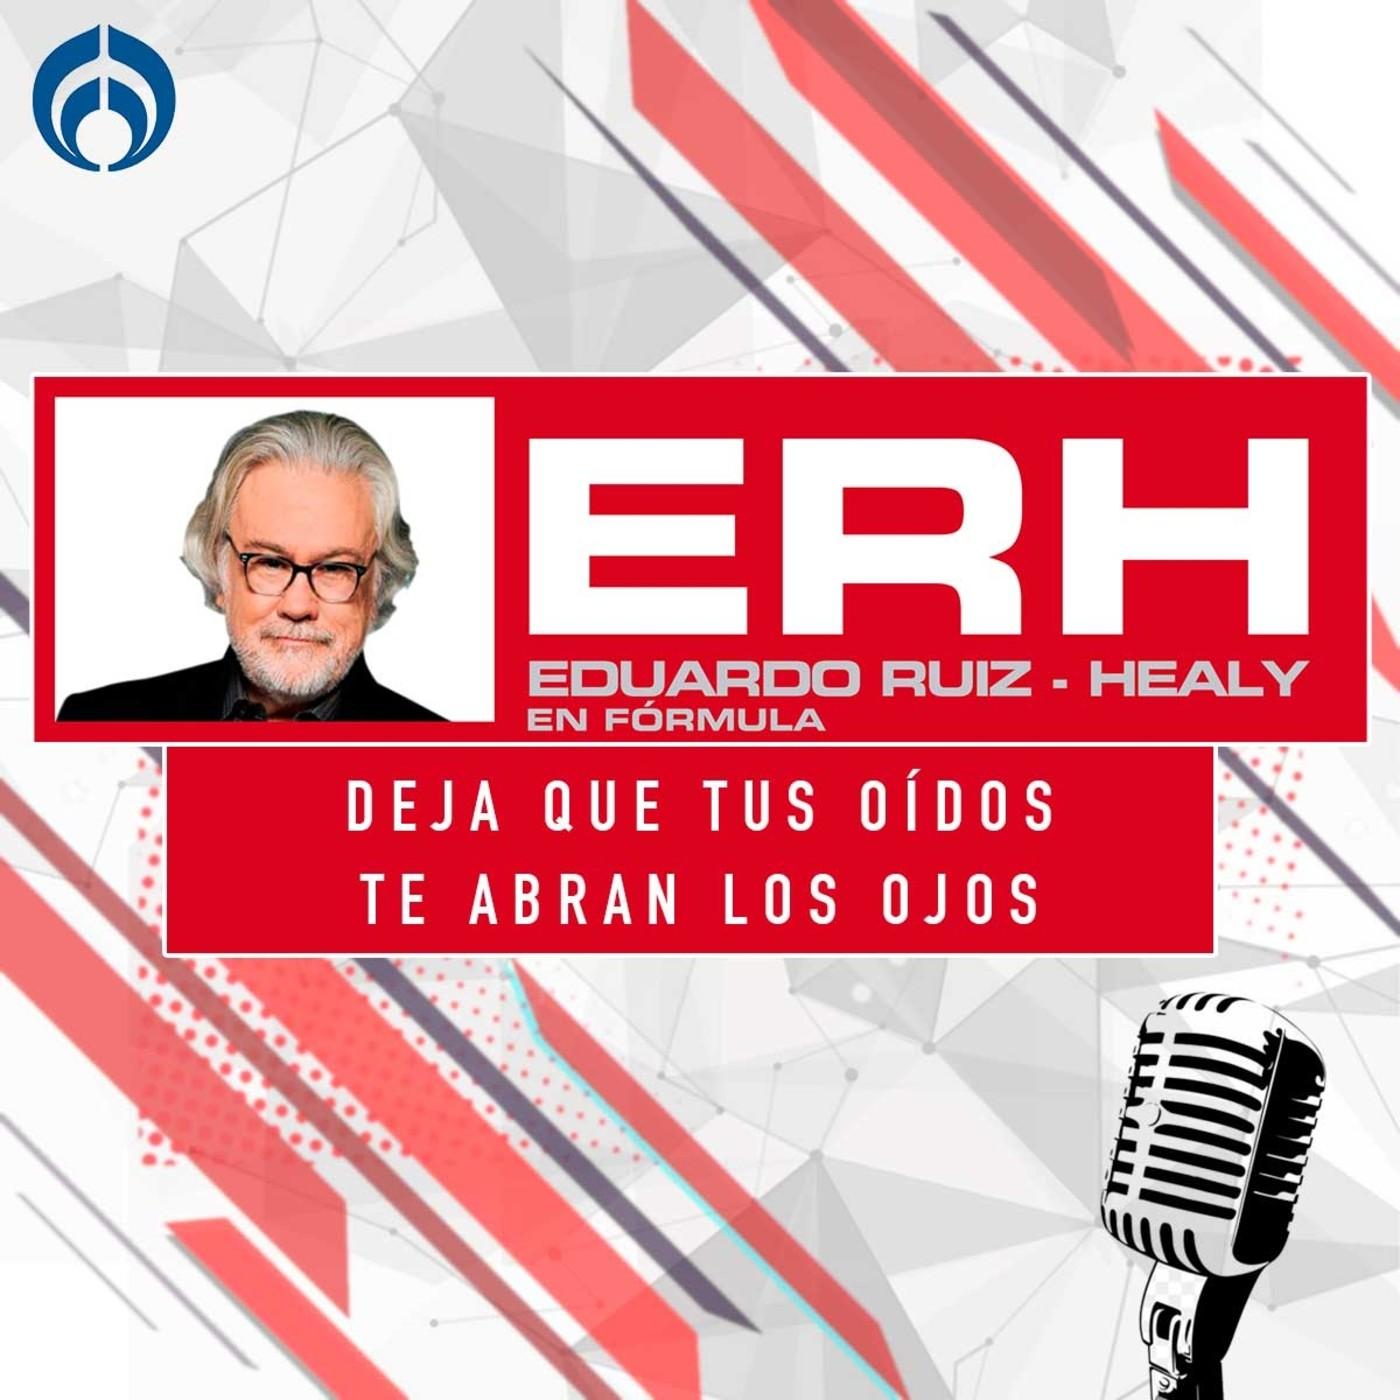 Eduardo Ruiz-Healy en Fórmula